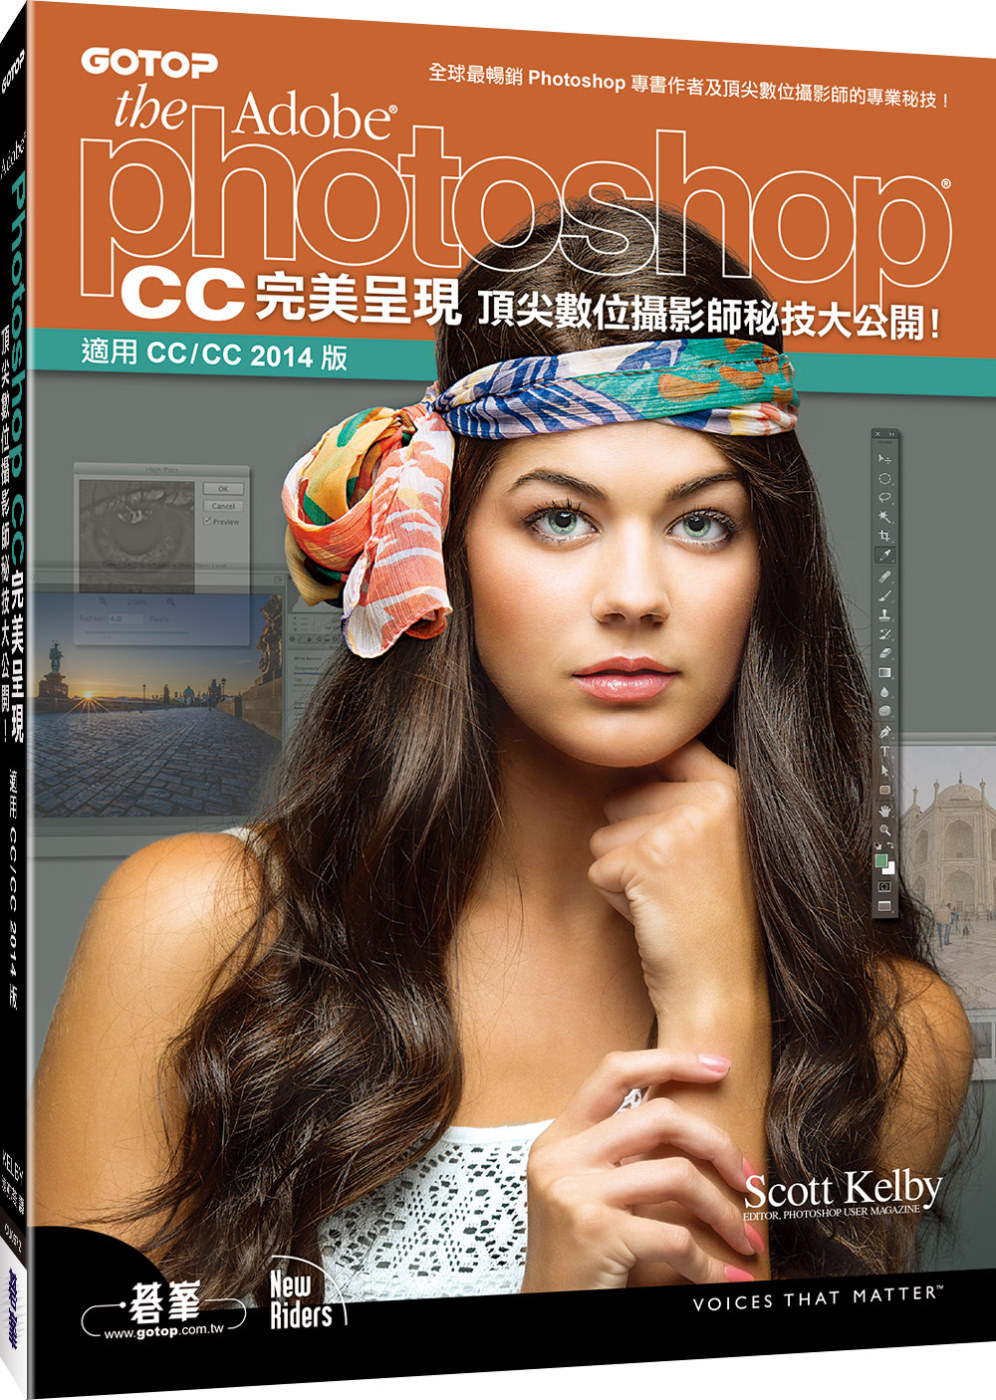 Photoshop CC完美呈現:頂尖數位攝影師秘技大公開!(適用CC/CC 2014版)